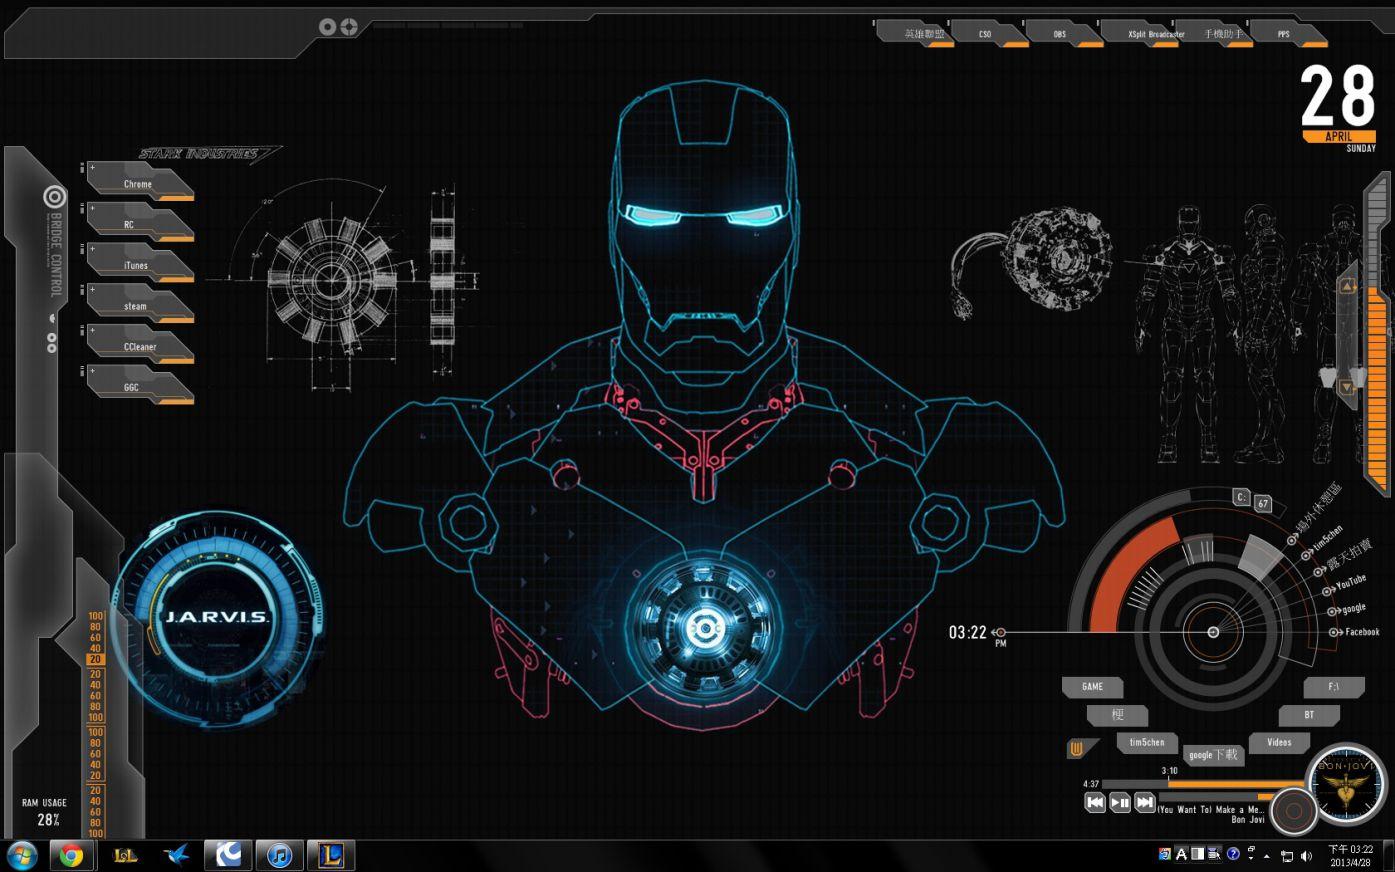 Animated Wallpaper Windows 8 Free 鋼鐵人桌面優化 圖文教學 Tim5chen的創作 巴哈姆特